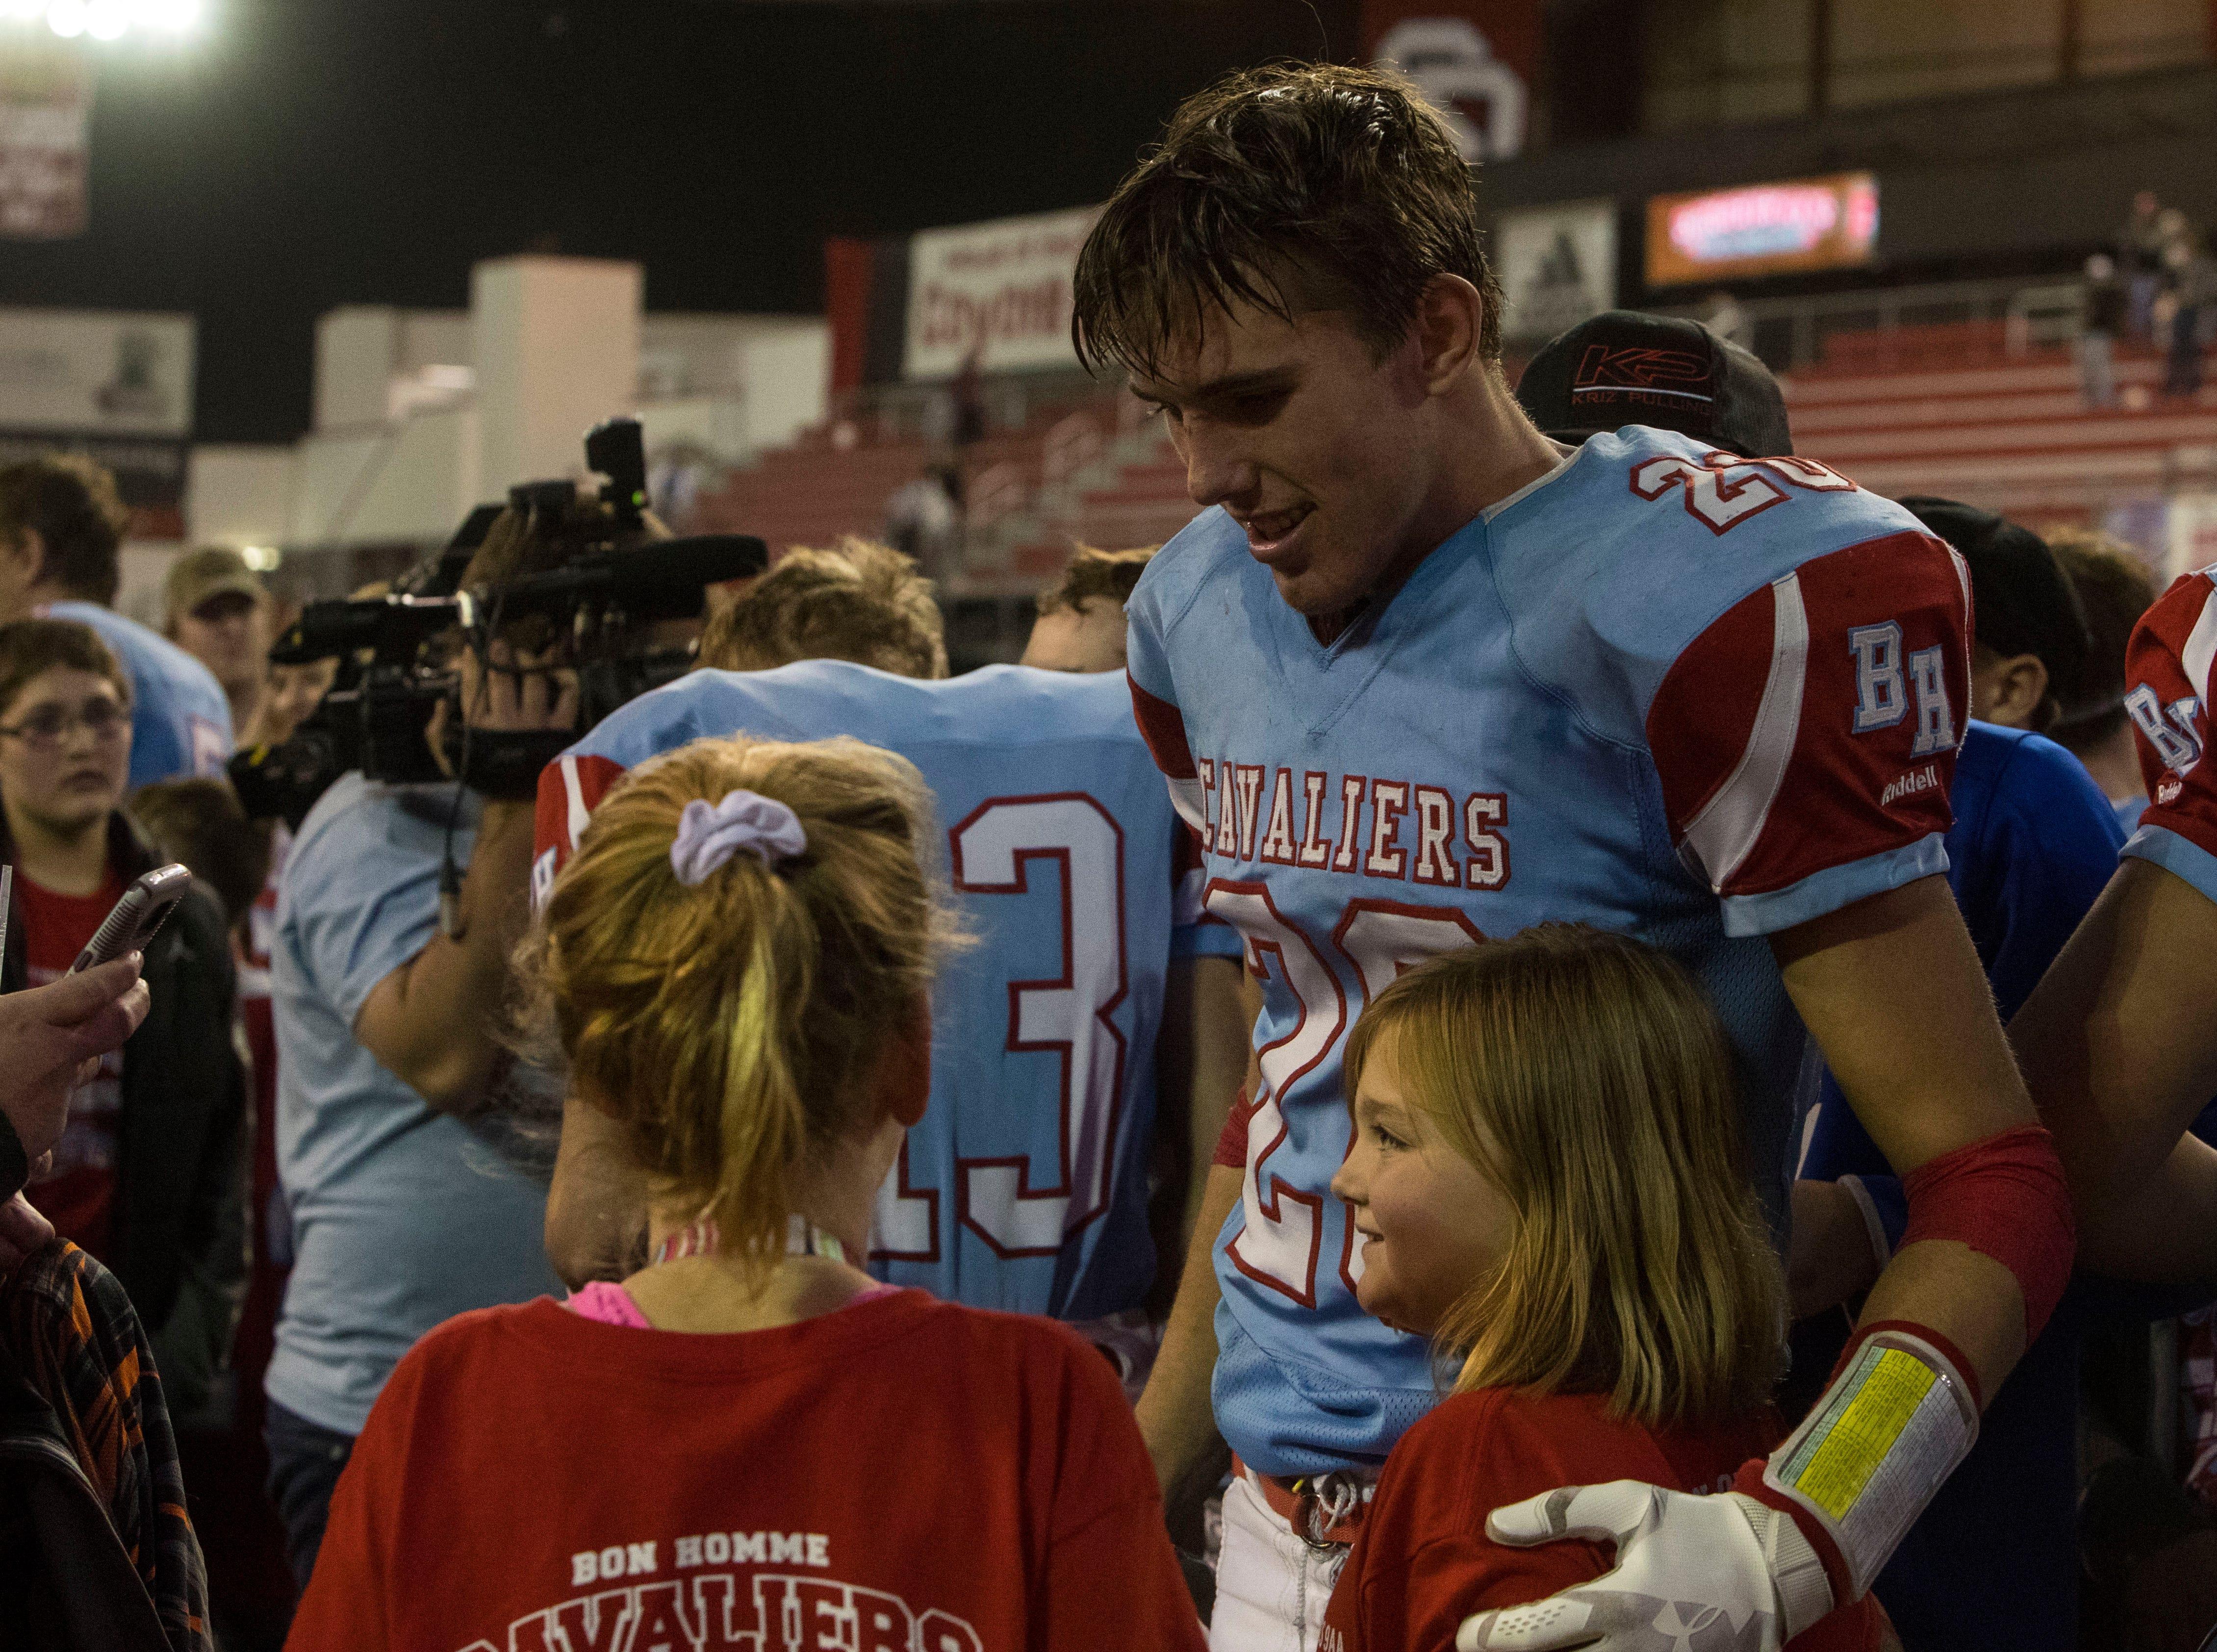 Joshua Crownover (20) celebrates after Bon Homme wins the class 9AA high school football championship, Thursday, Nov. 8, 2018 at the DakotaDome in Vermillion, S.D.